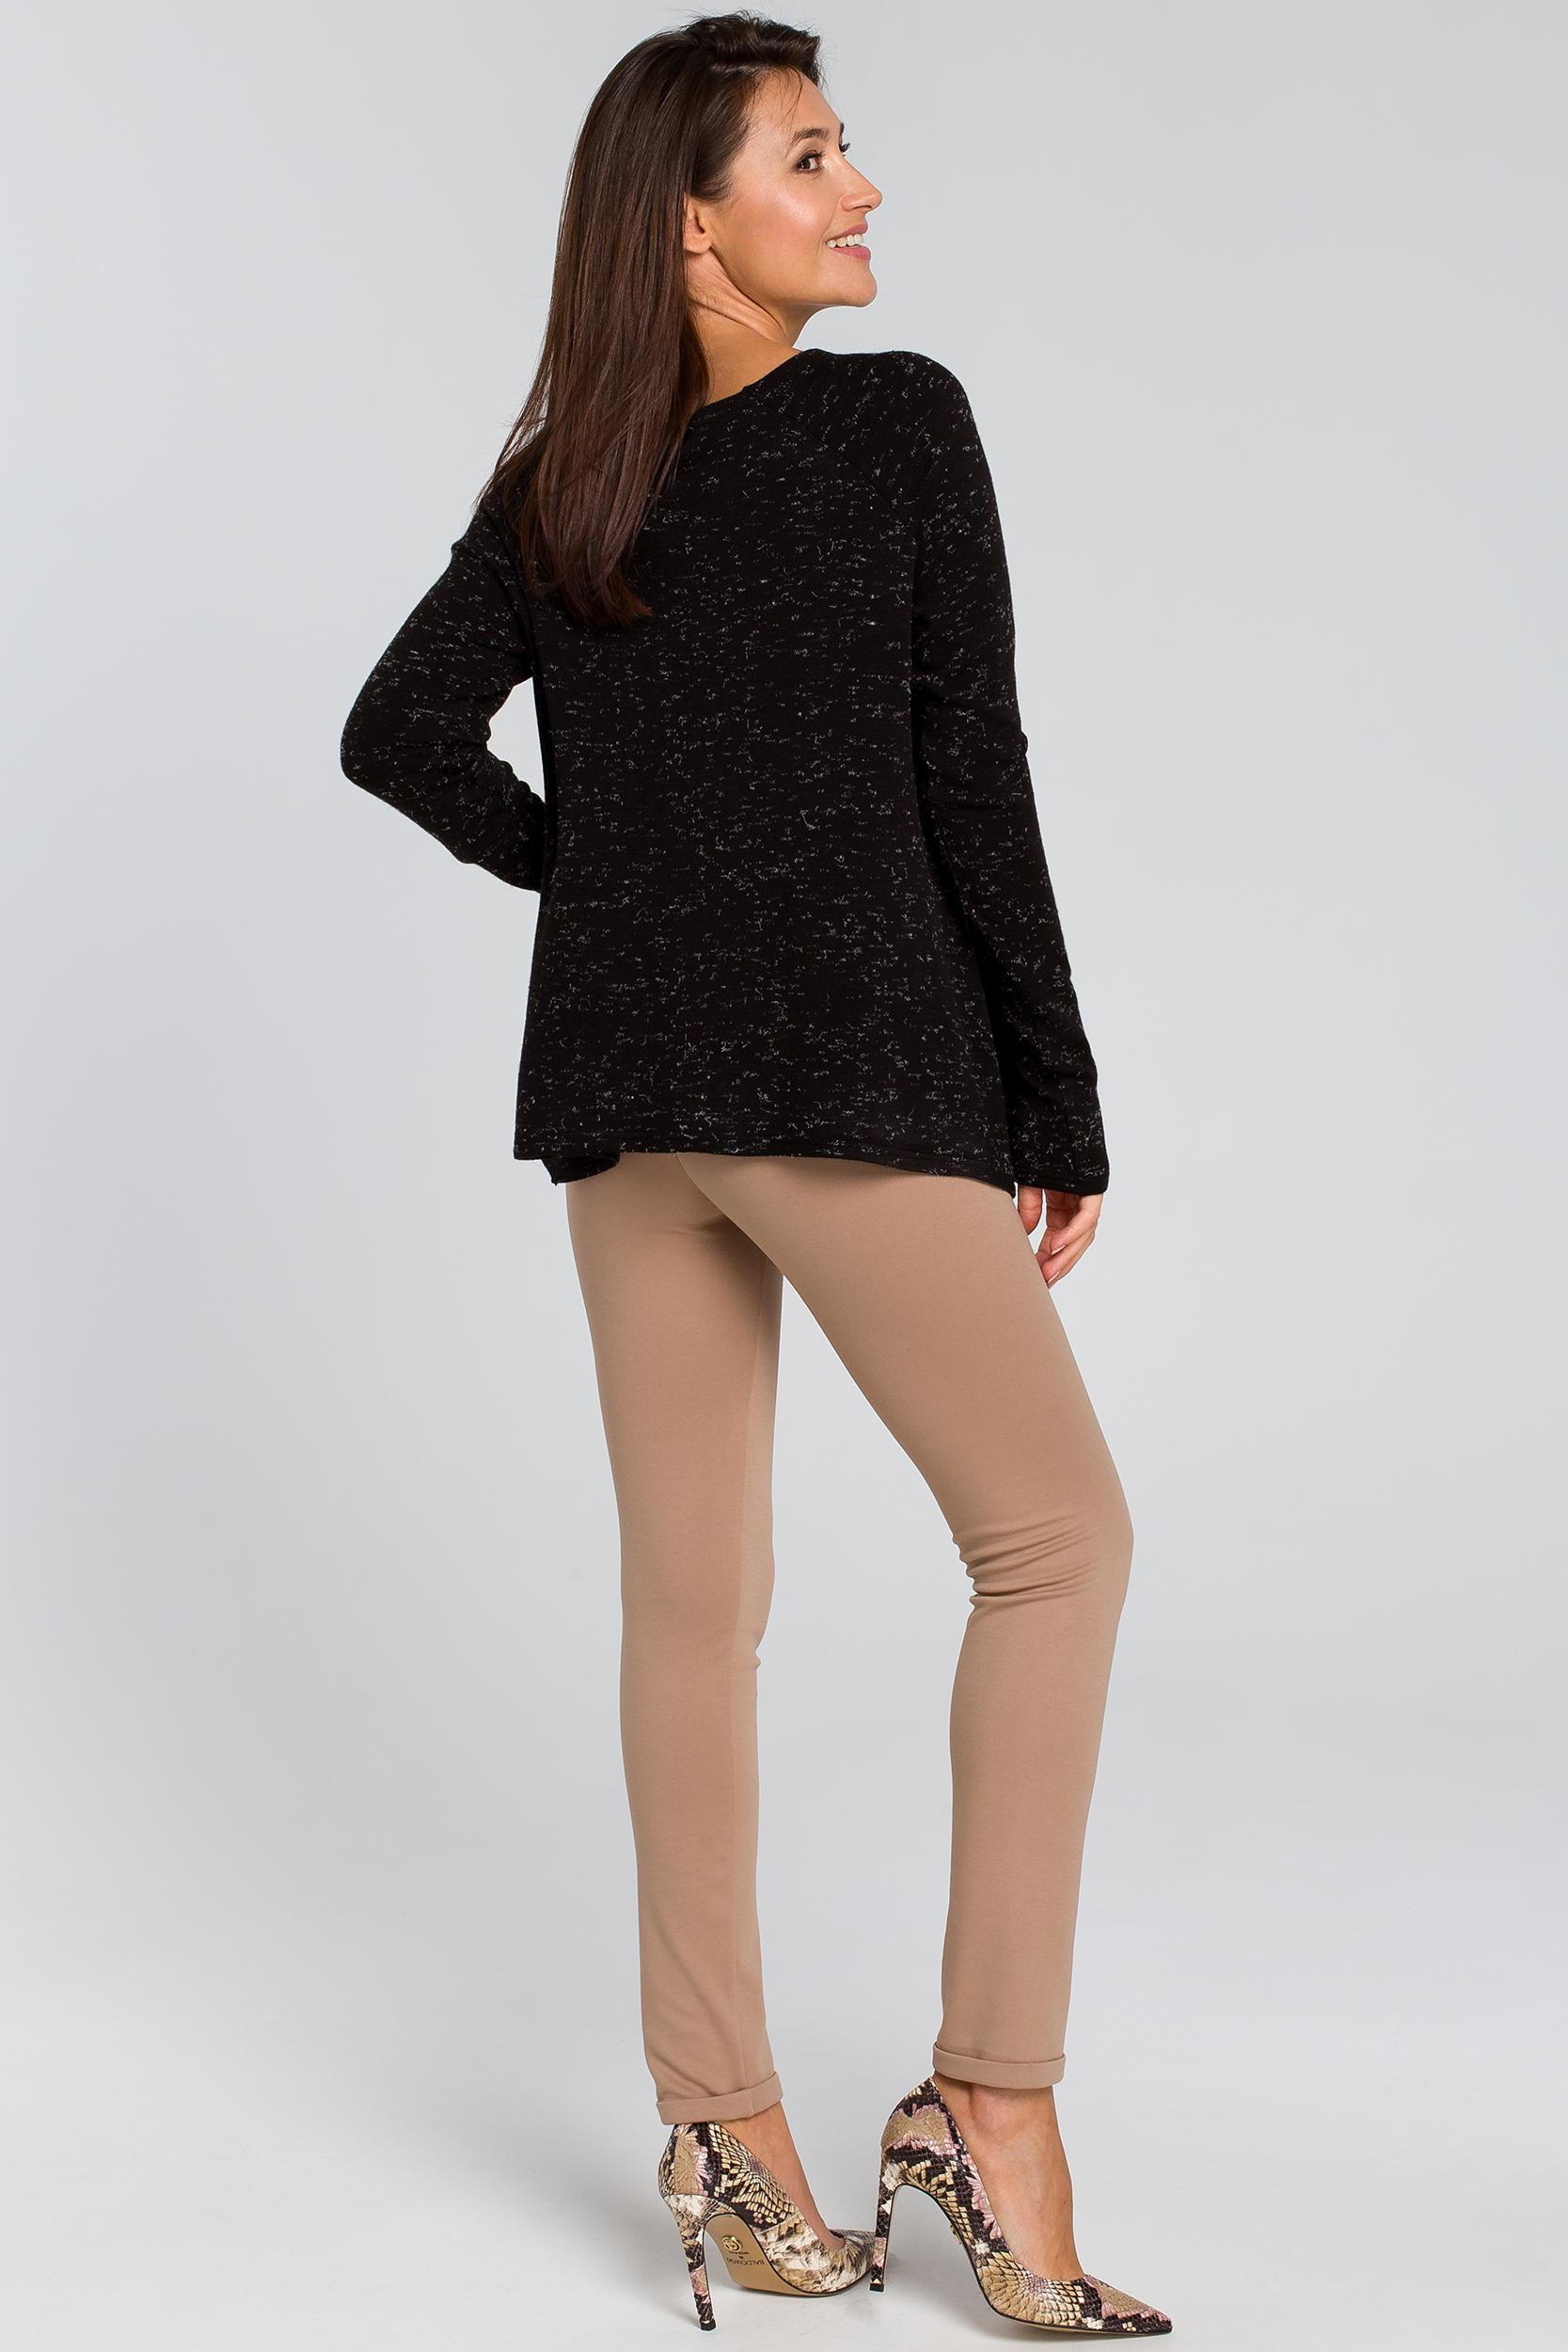 CM4137 Luźny asymetryczny sweter - czarny